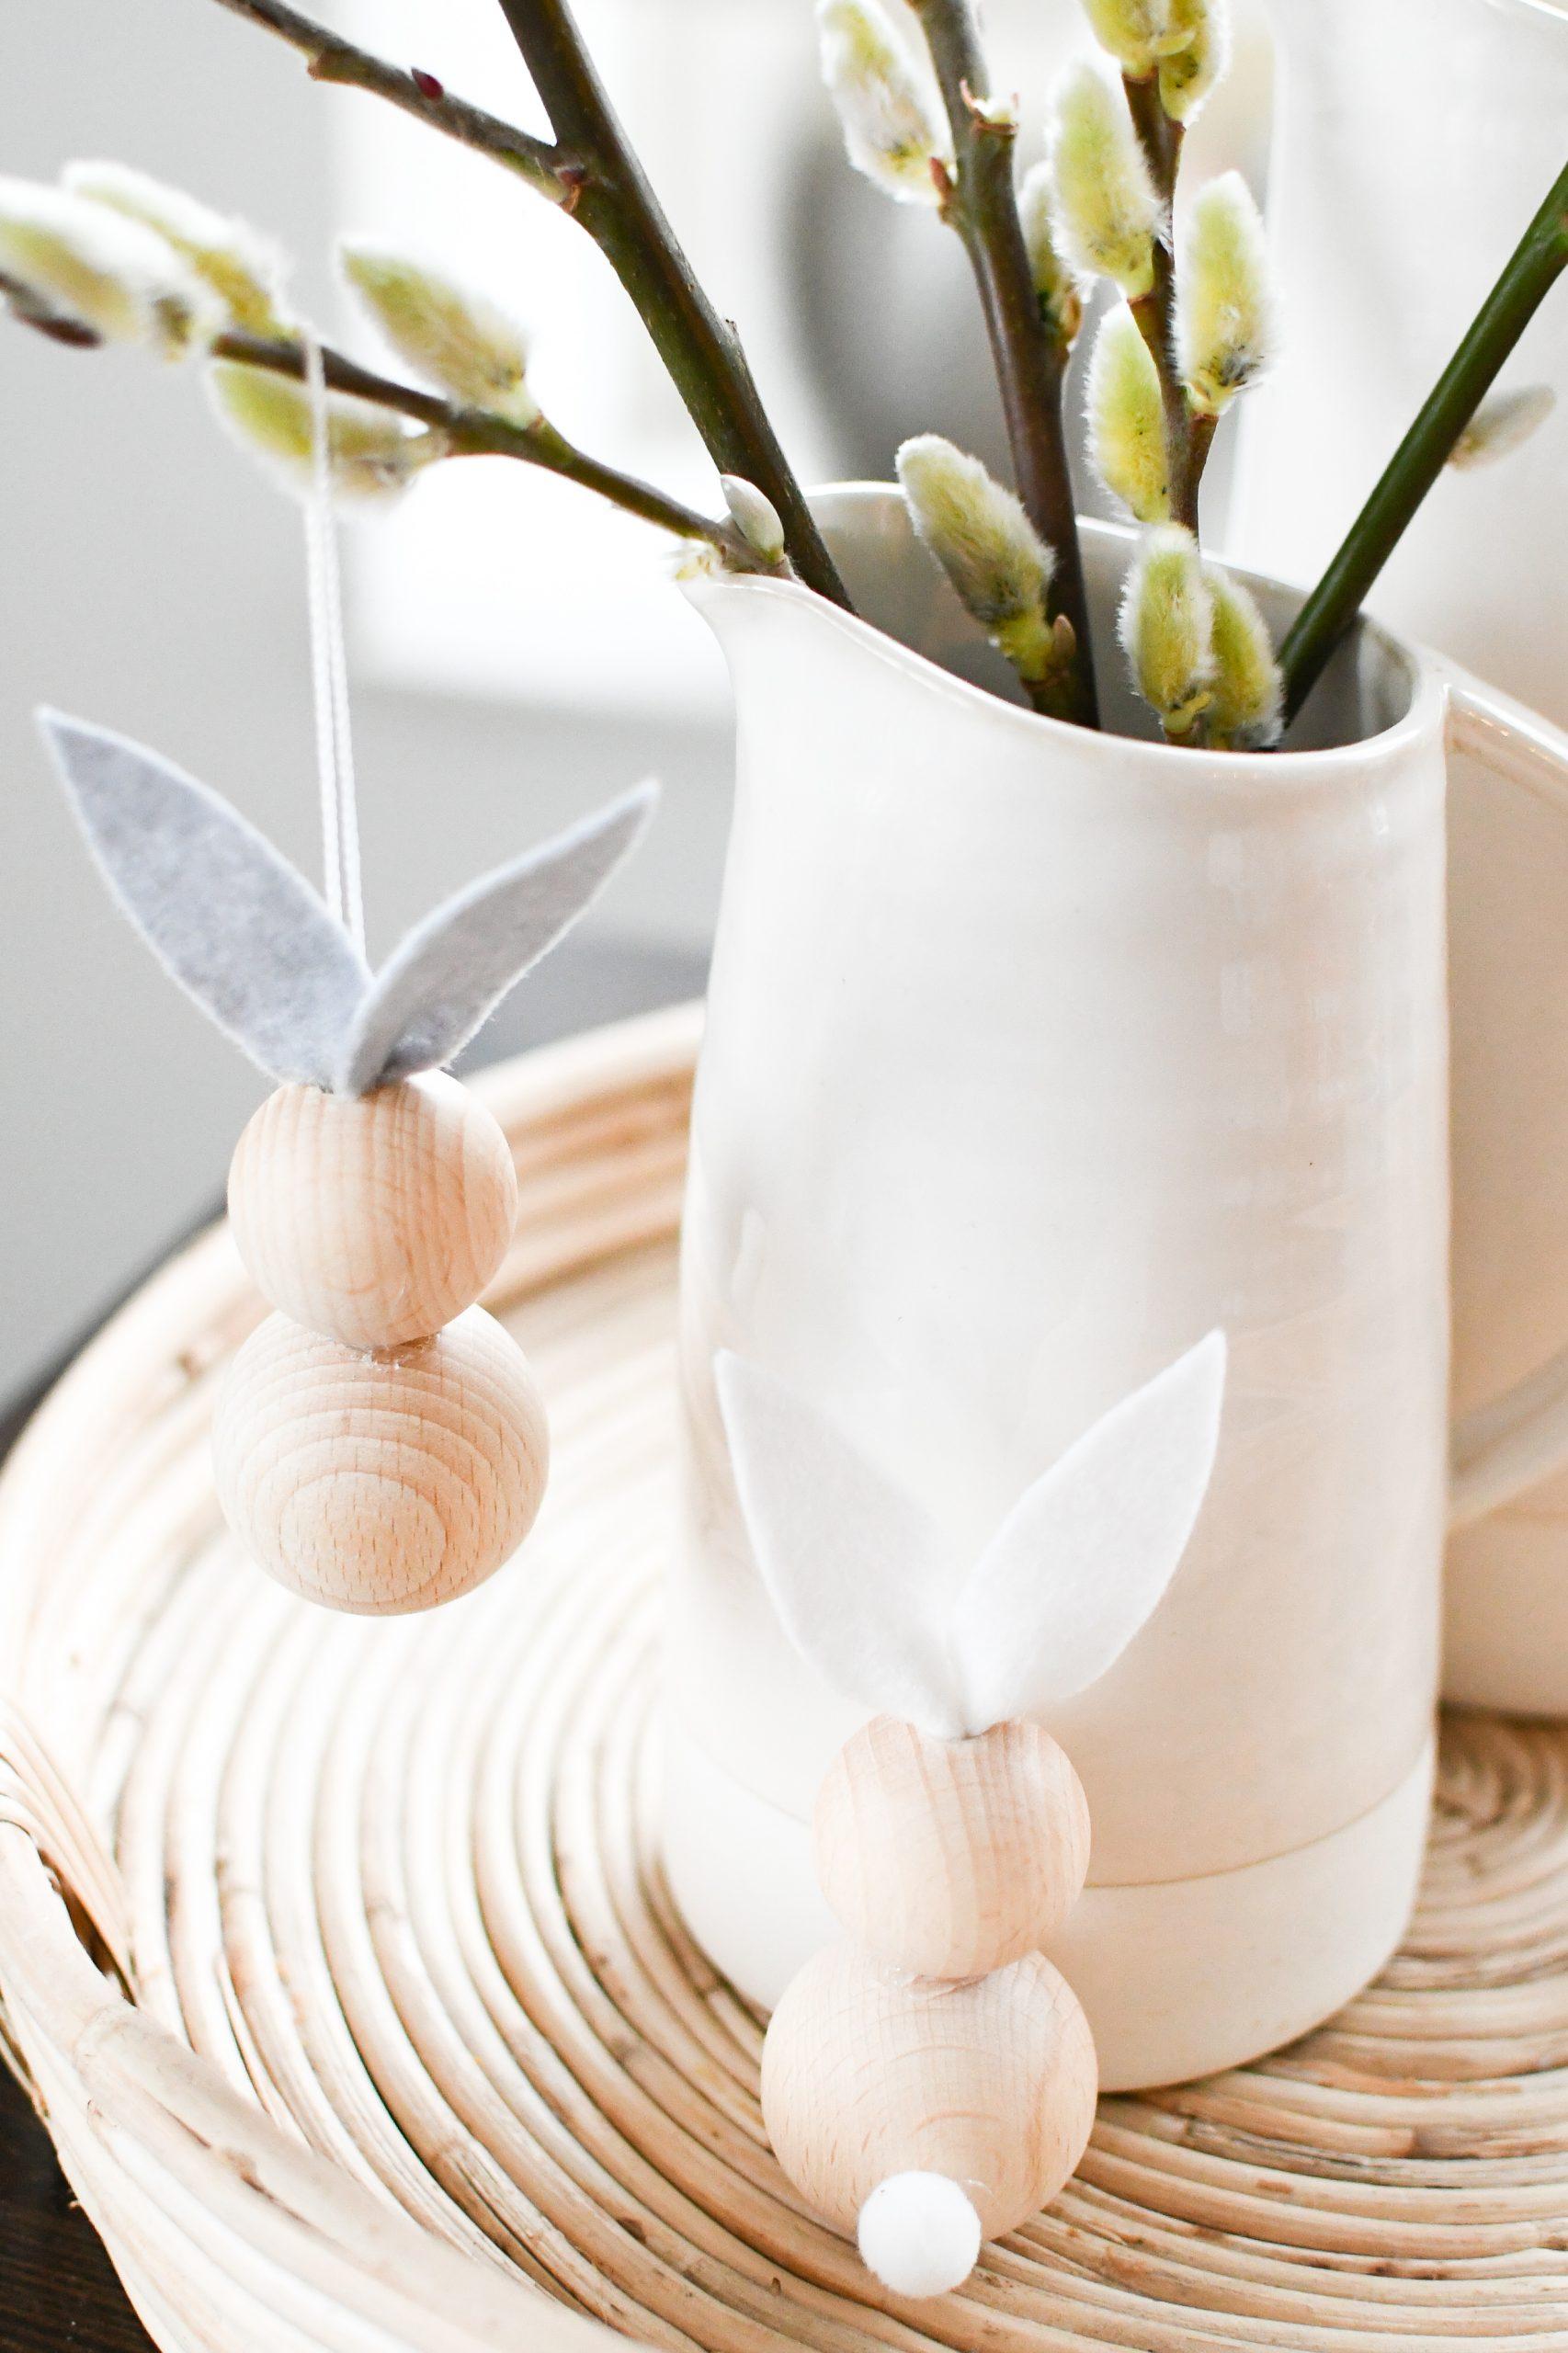 paastakken ornamenten konijntjes zelf maken